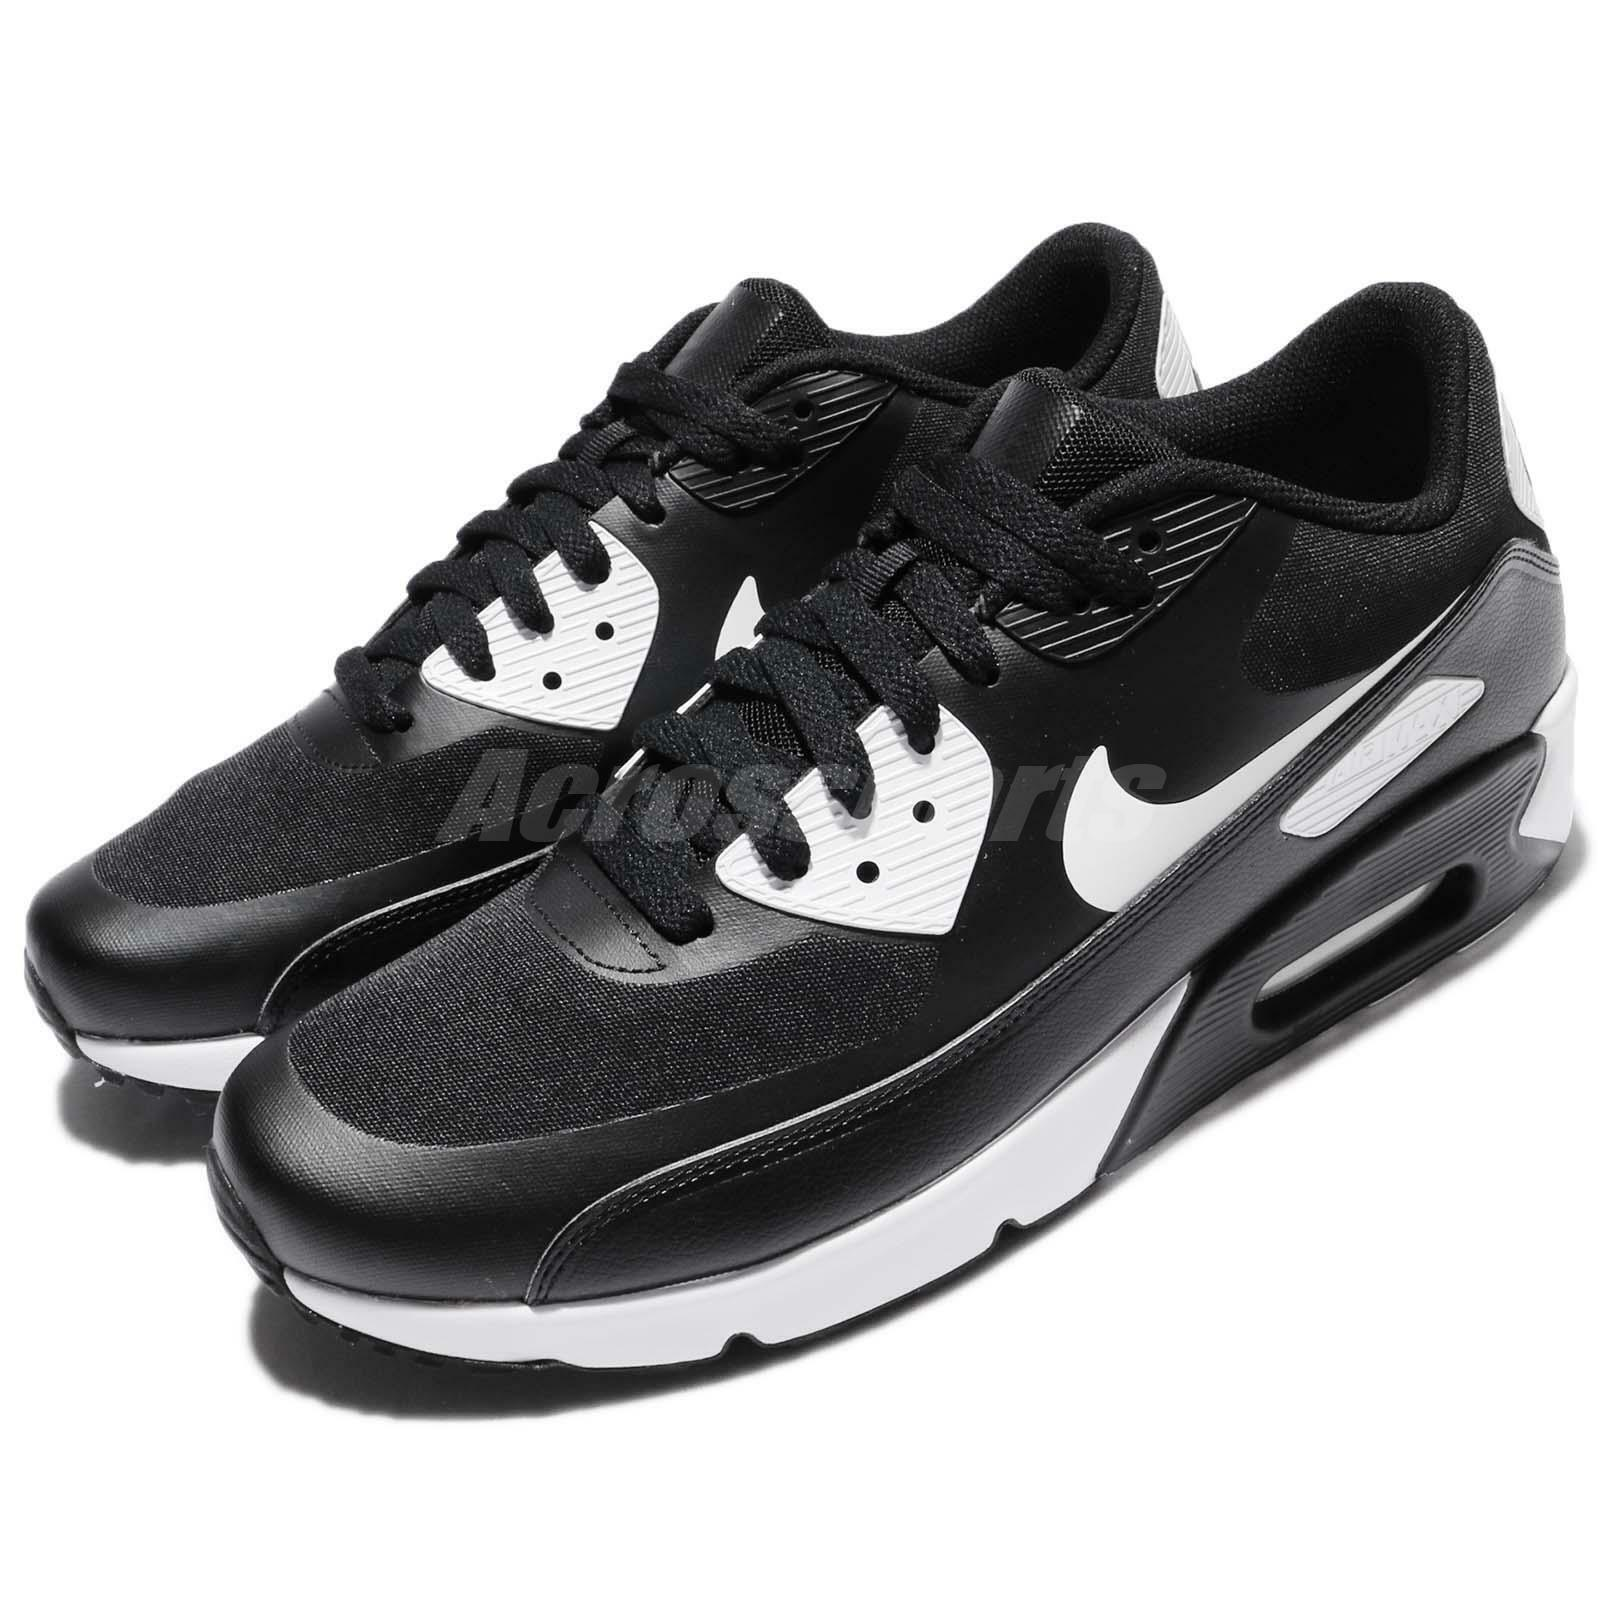 Nike Air Max 90 Ultra 2.0 Essential Black White Men Running Shoes 875695 008